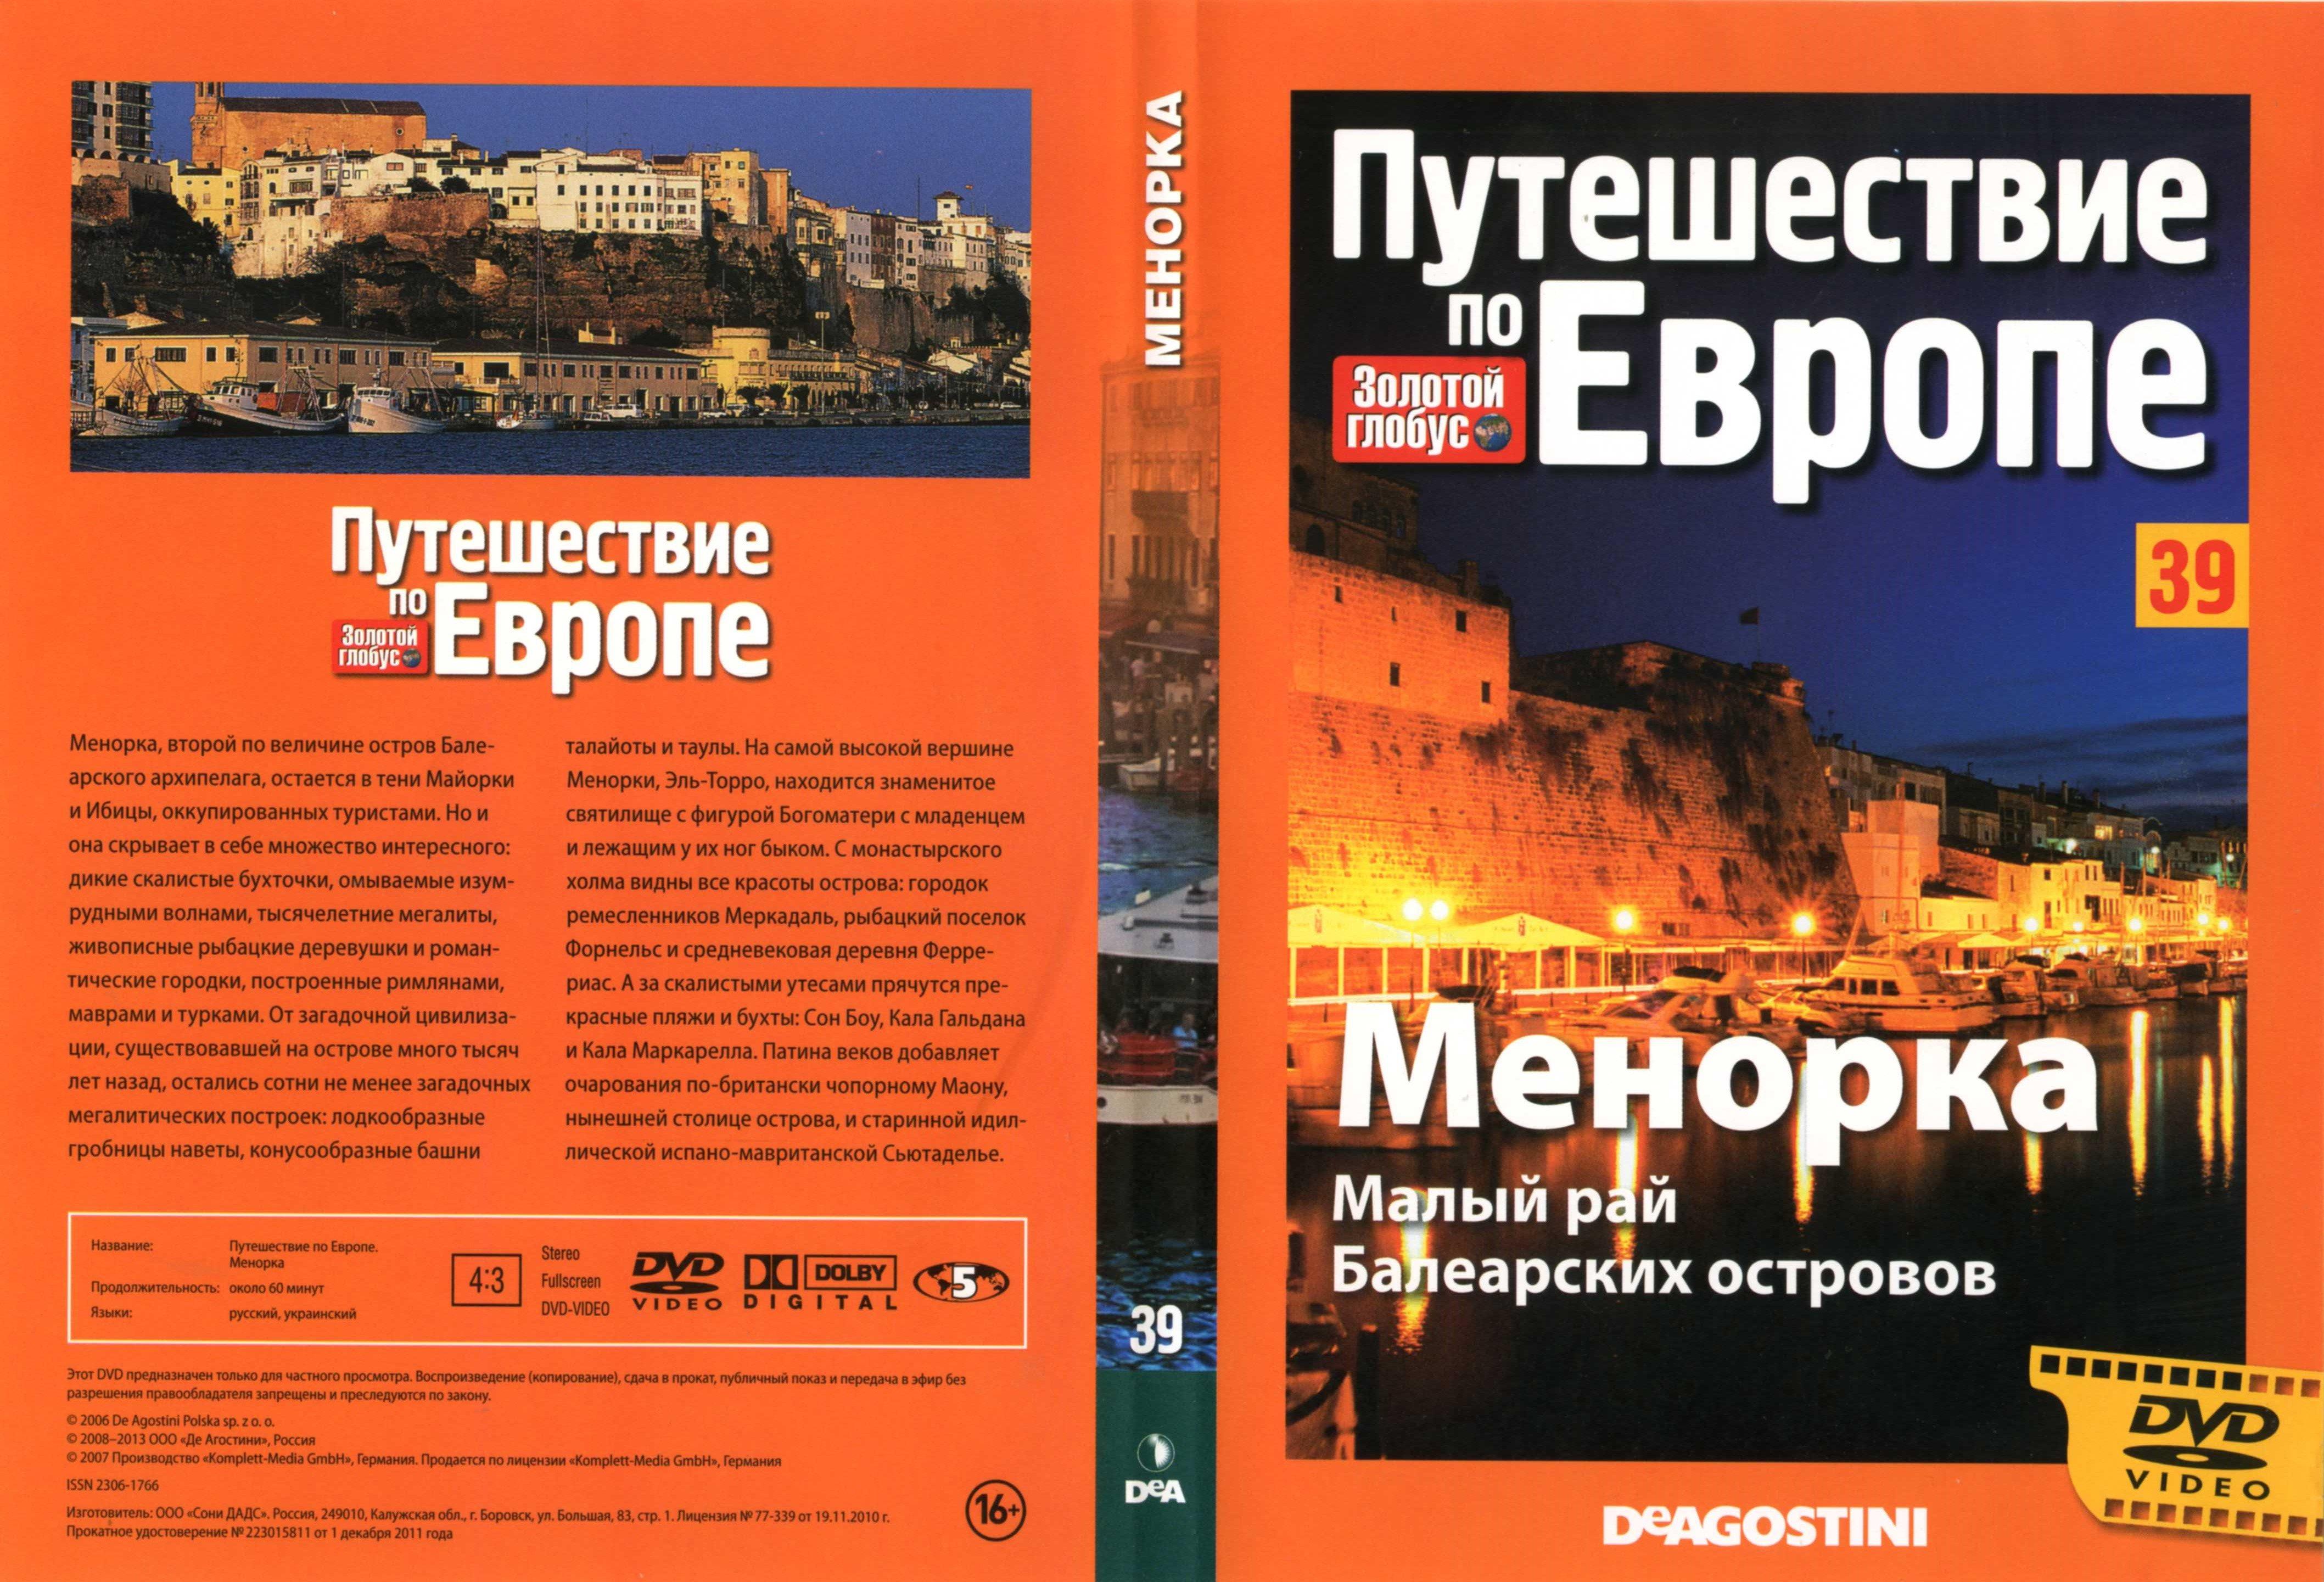 http://i5.imageban.ru/out/2013/10/29/ca438151ba0d6f2dab2d09d3f311c88f.jpg